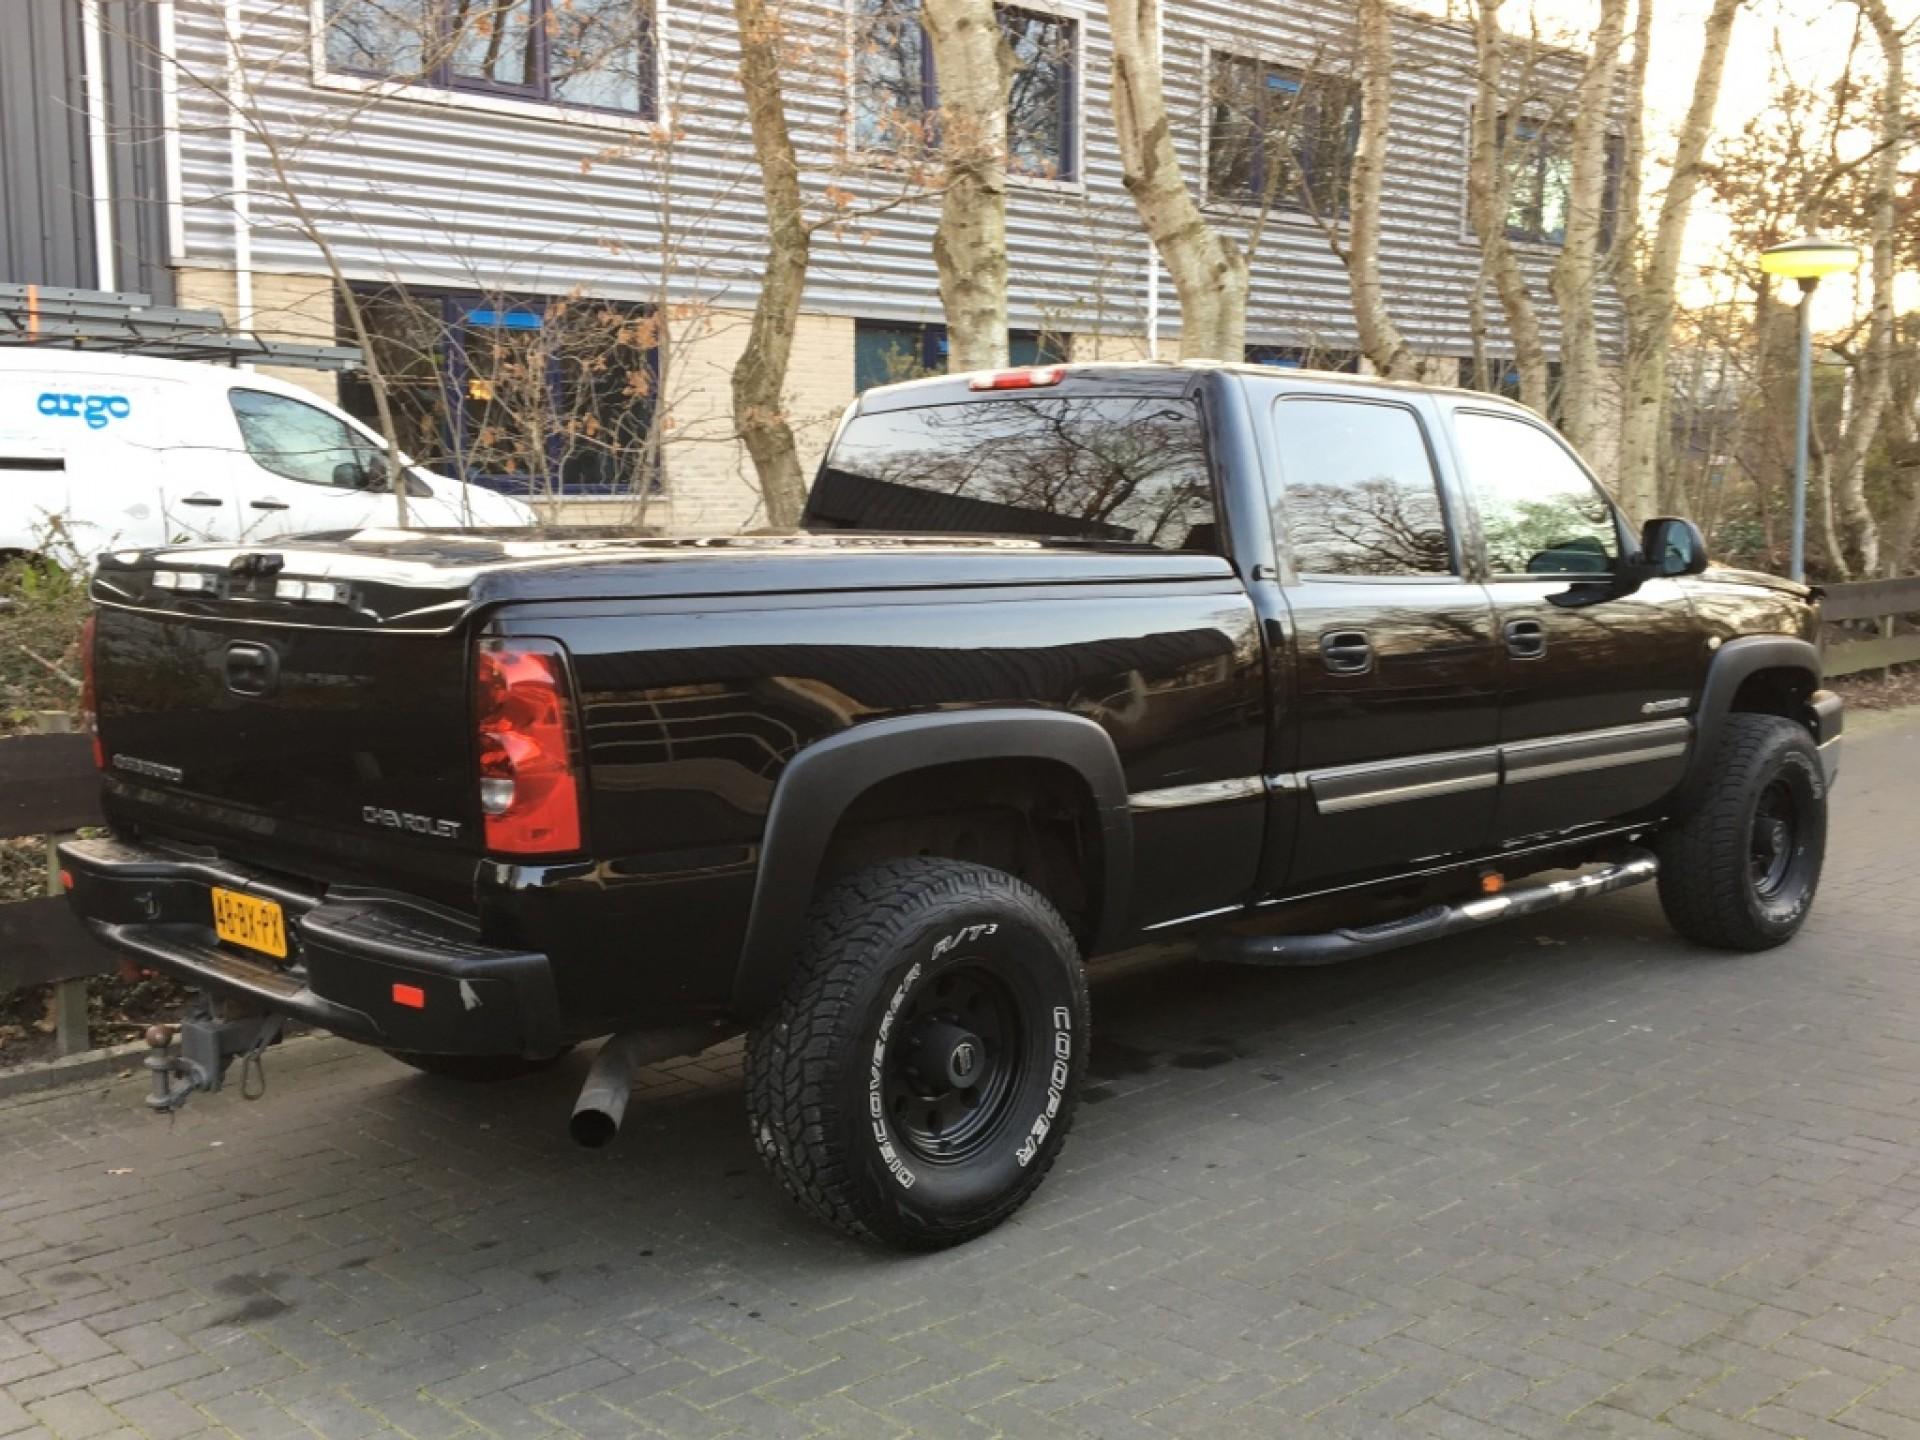 Chevrolet Pick Up Silverado K2500 Hd 4x4 6 6 V8 Duramax